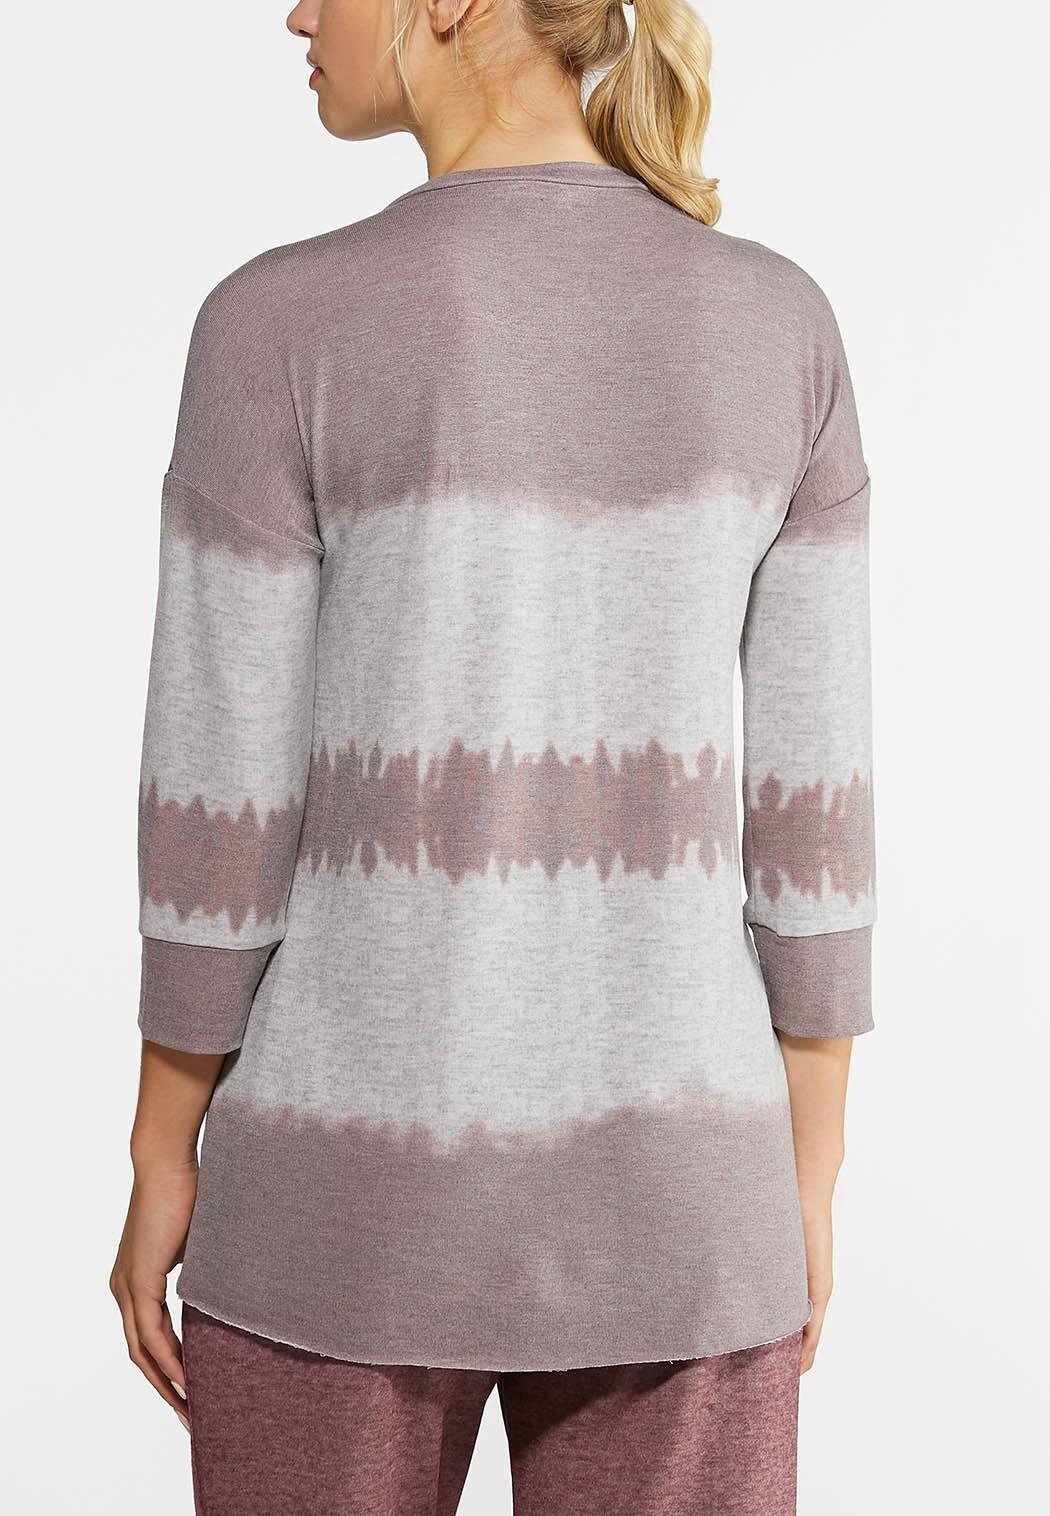 Plus Size Tie Dye Tunic Top (Item #43966216)